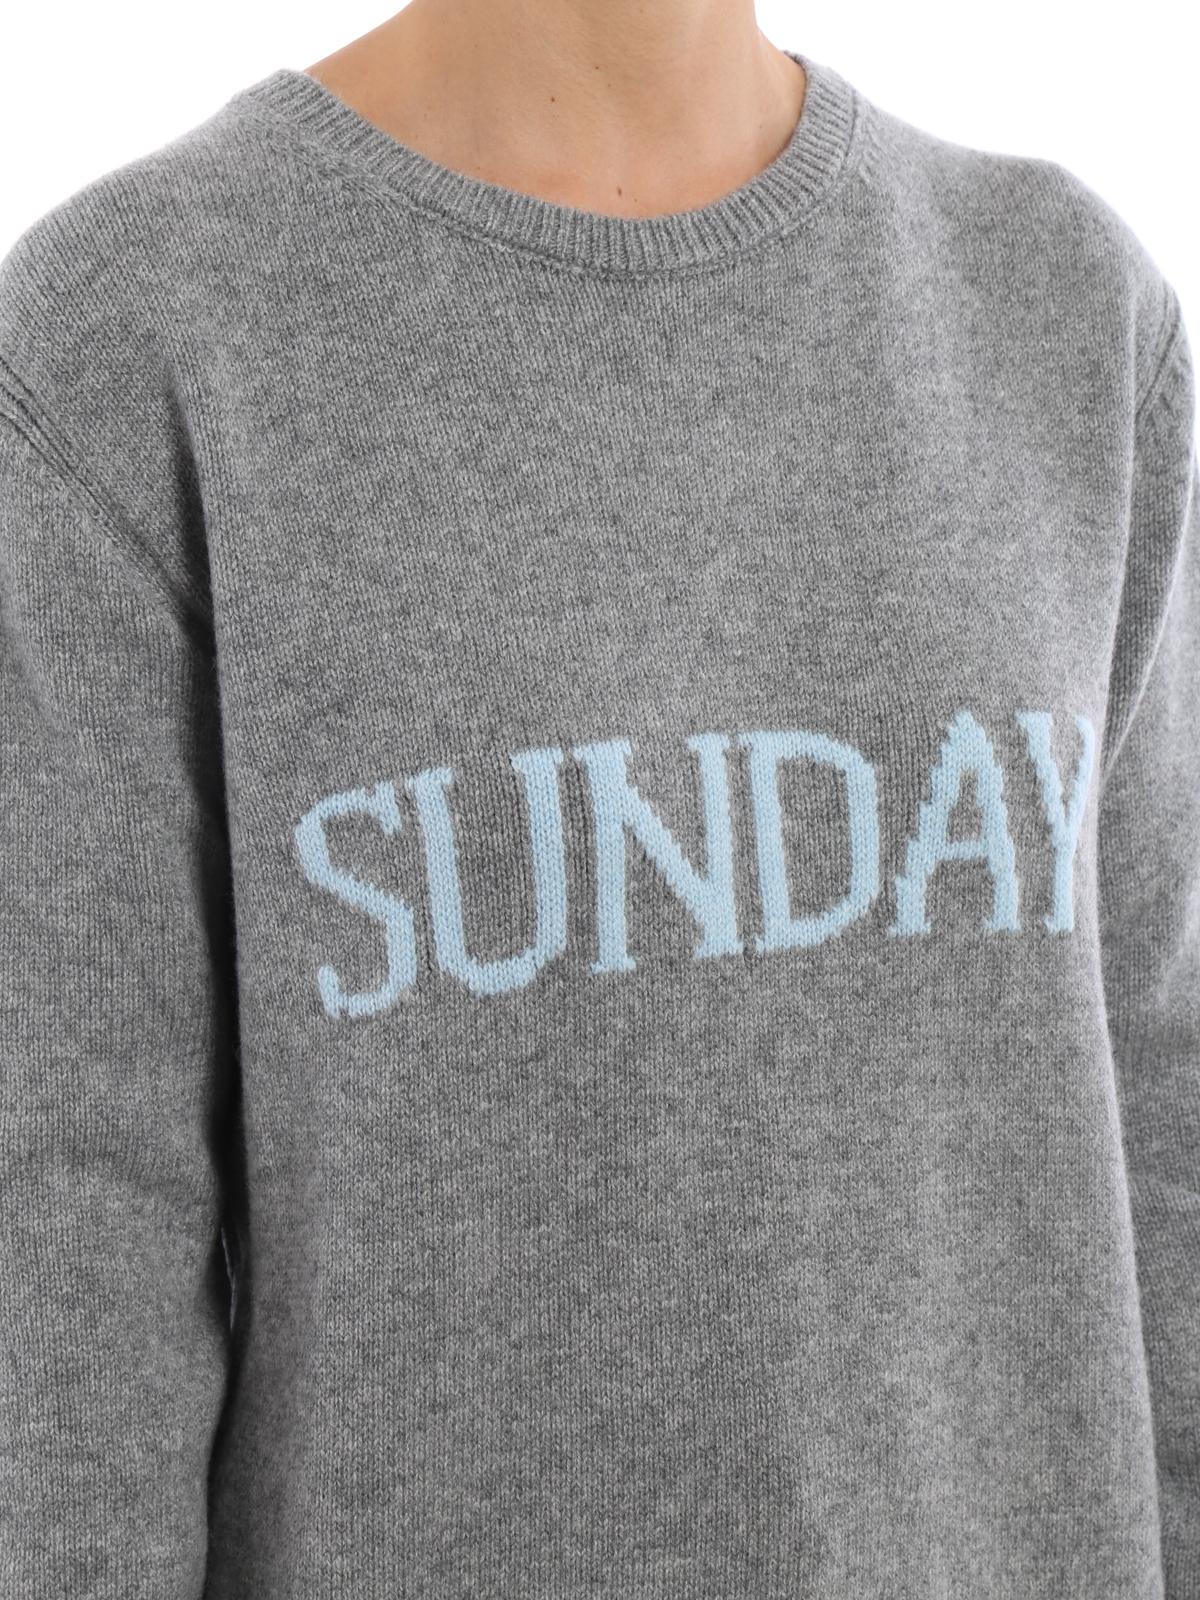 Sunday wool and cashmere sweater by Alberta Ferretti - crew necks ...